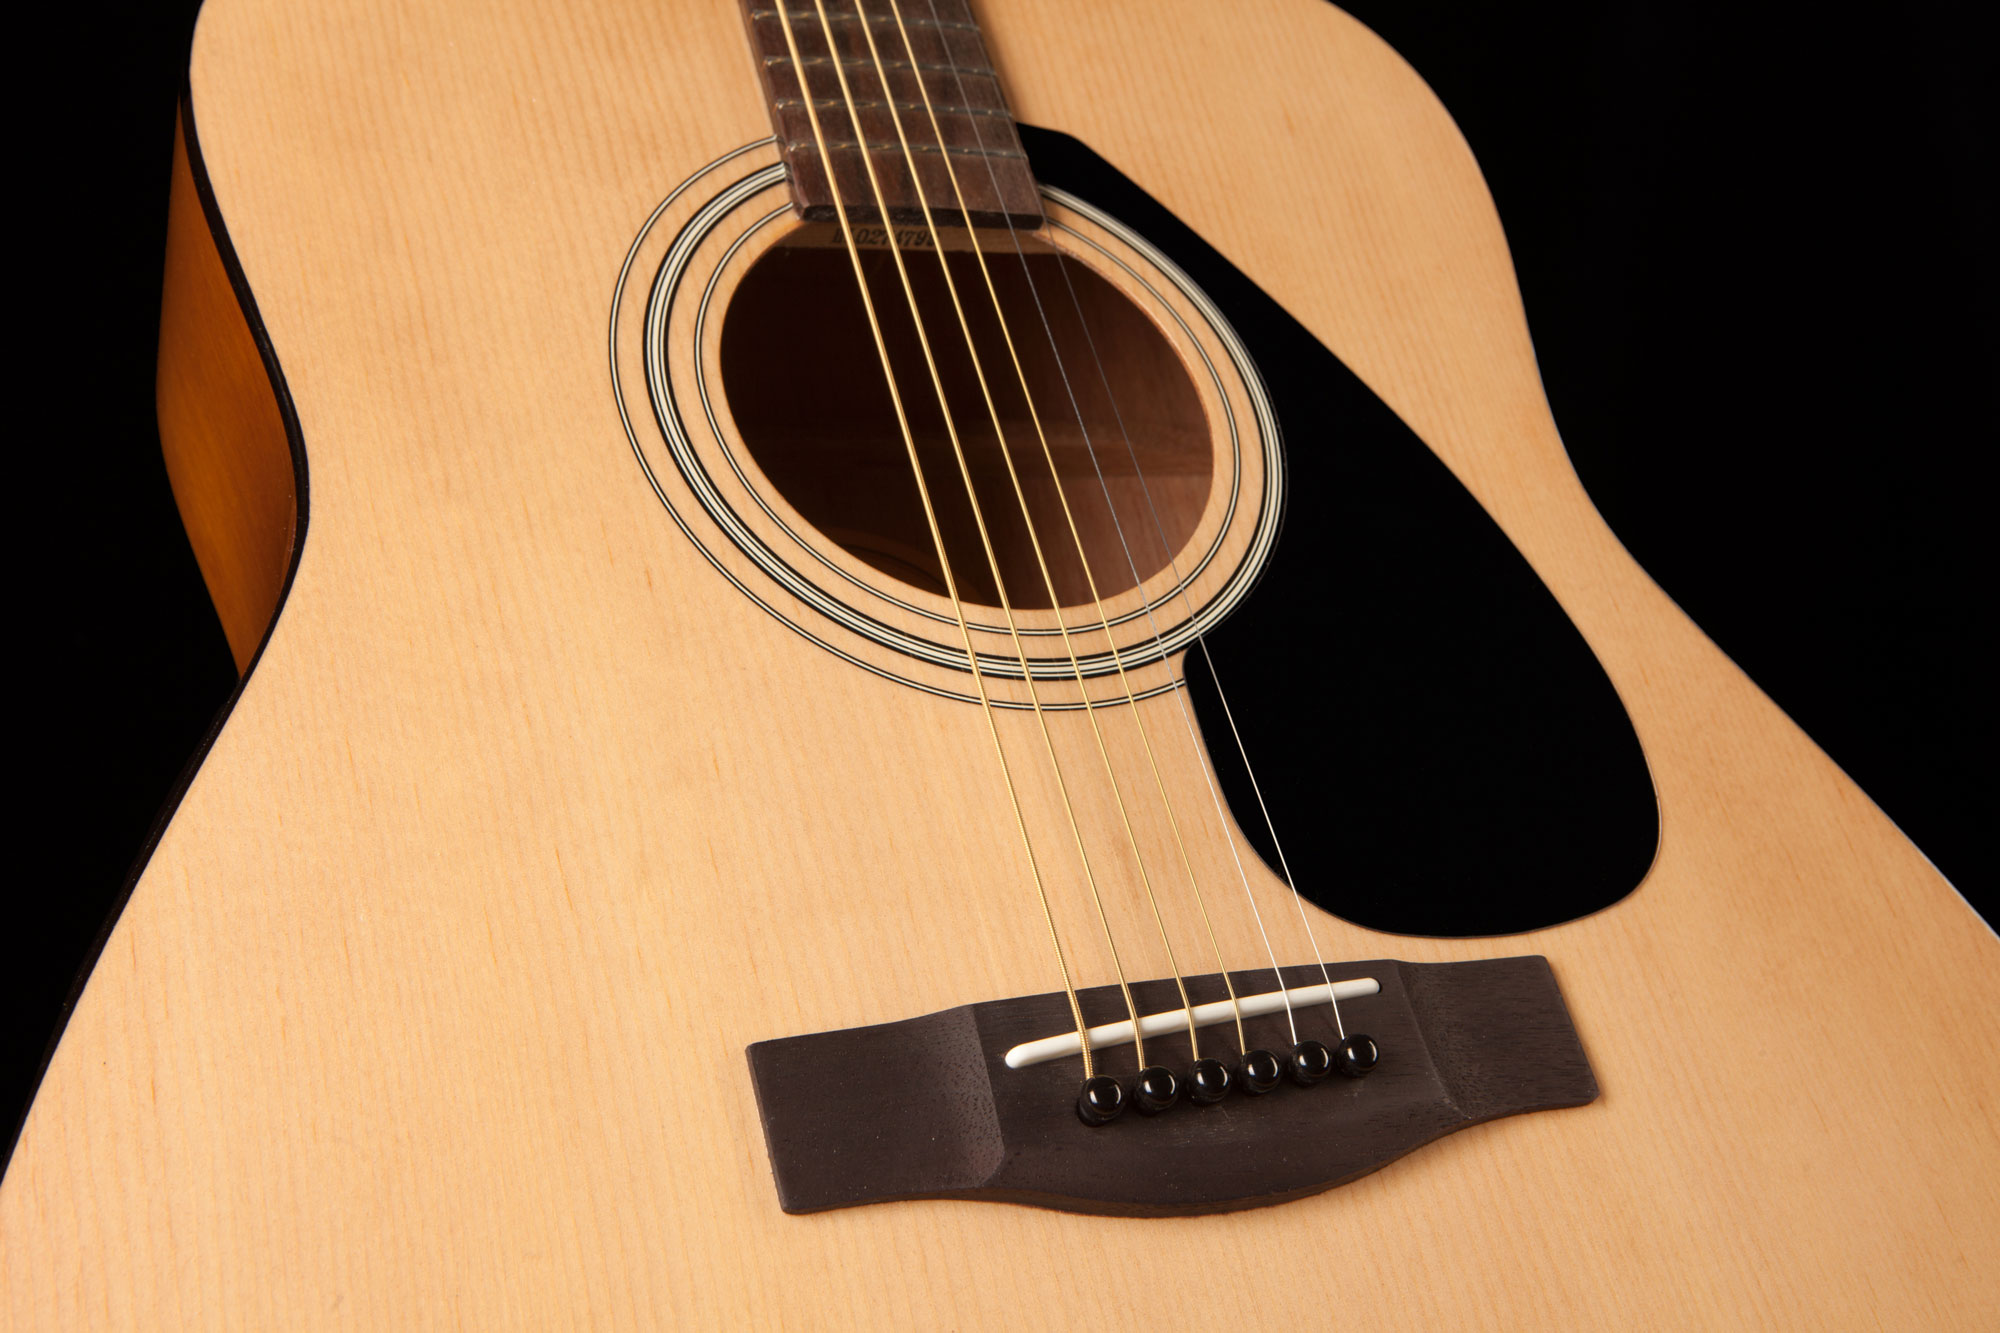 c0234938a6d Yamaha F310 Acoustic Guitar in Natural finish | Yamaha Music London